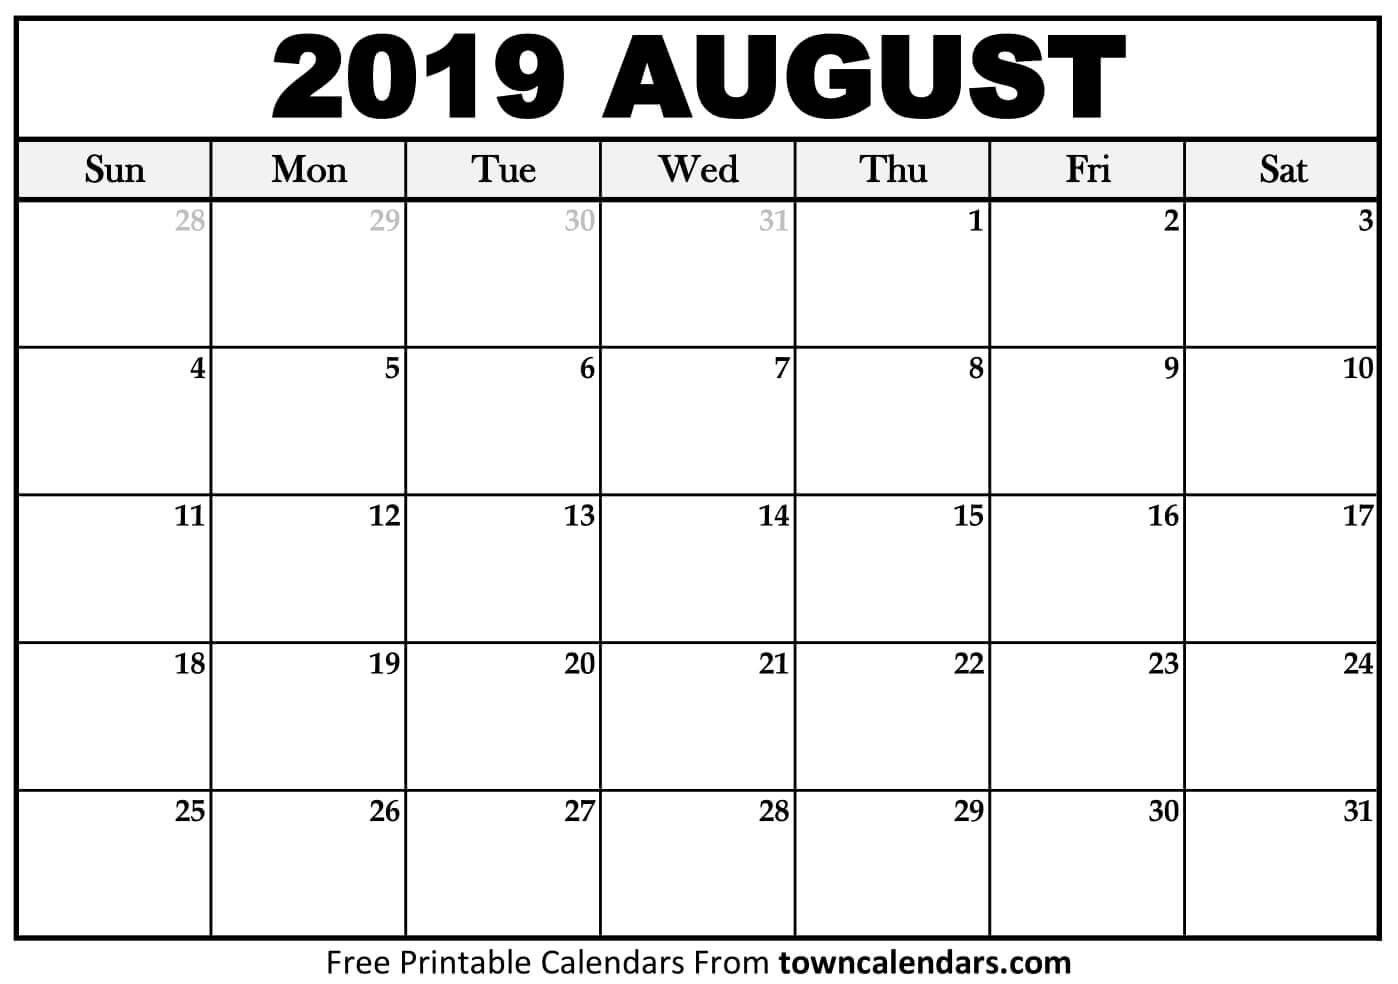 Printable August 2019 Calendar - Towncalendars August 1 2019 Calendar